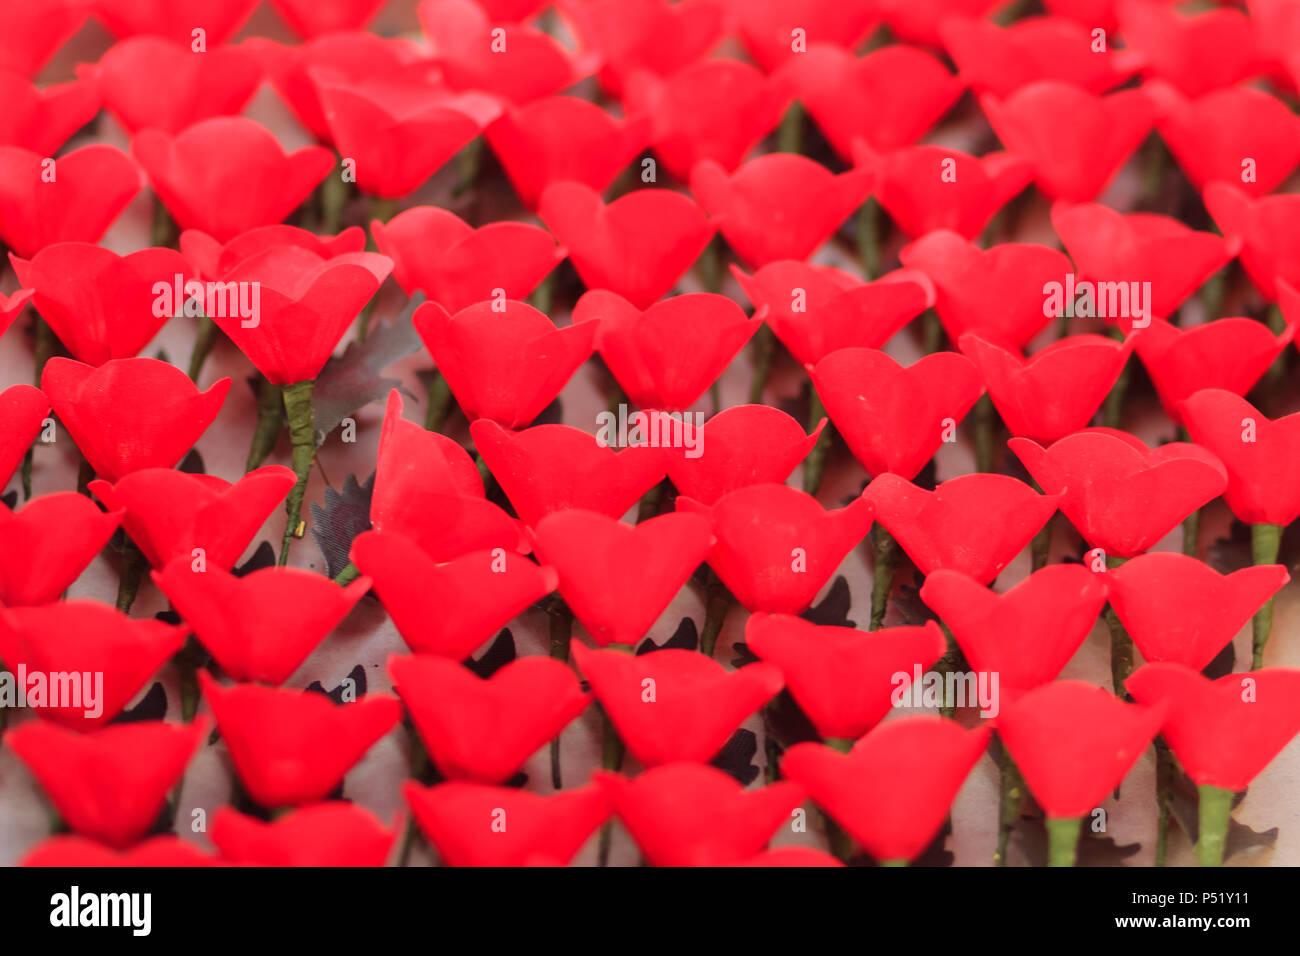 Beautiful red artificial flower poppy flower artificial is symbol beautiful red artificial flower poppy flower artificial is symbol of veterans day mightylinksfo